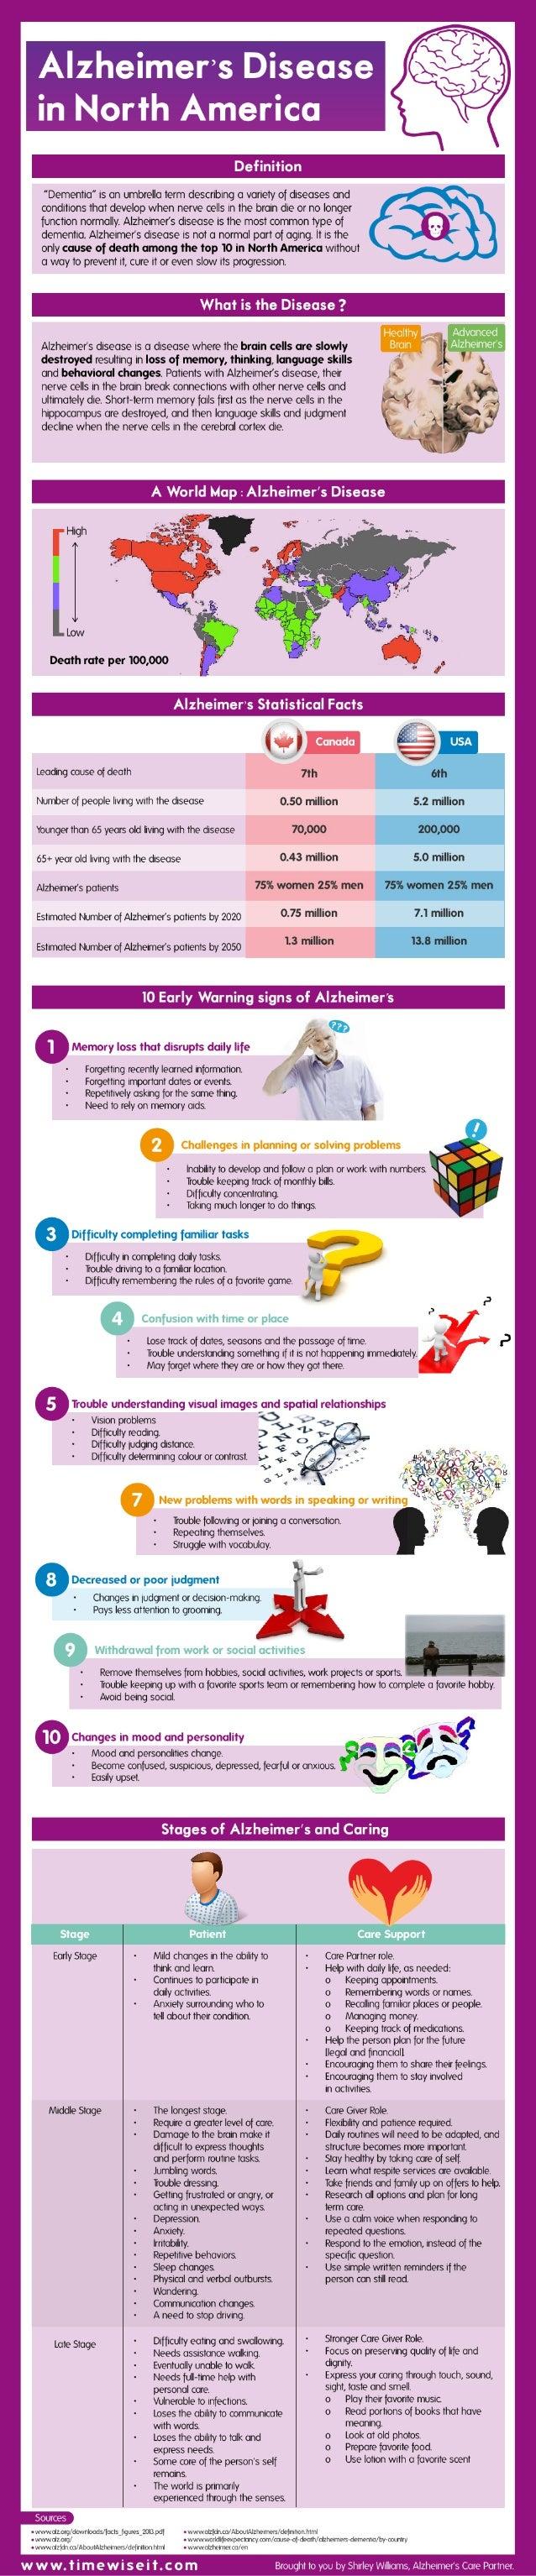 Alzheimer's Disease In North America